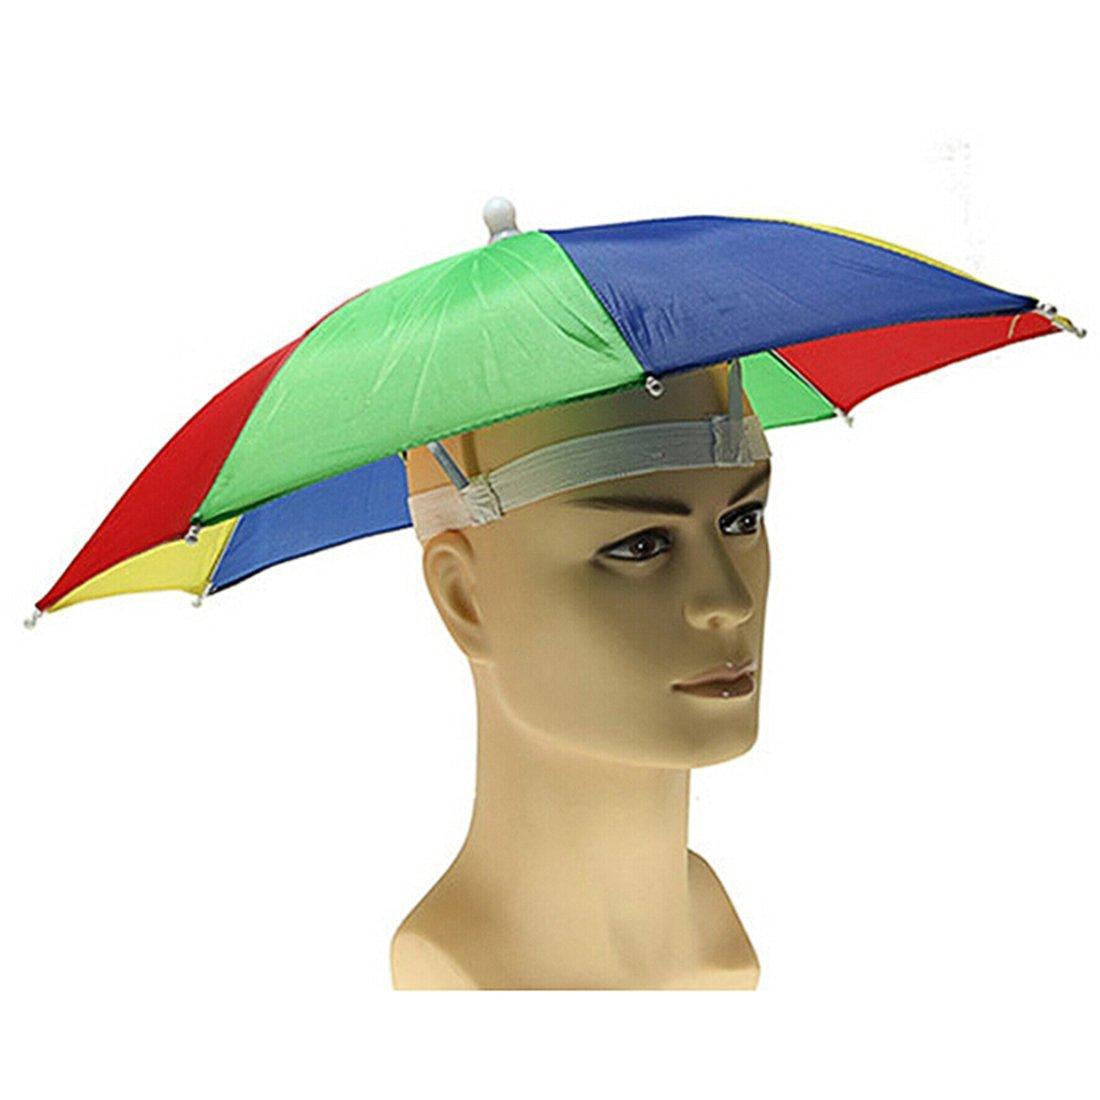 c378ad7c72035 Get Quotations · Fishing Umbrella Hat Headwear